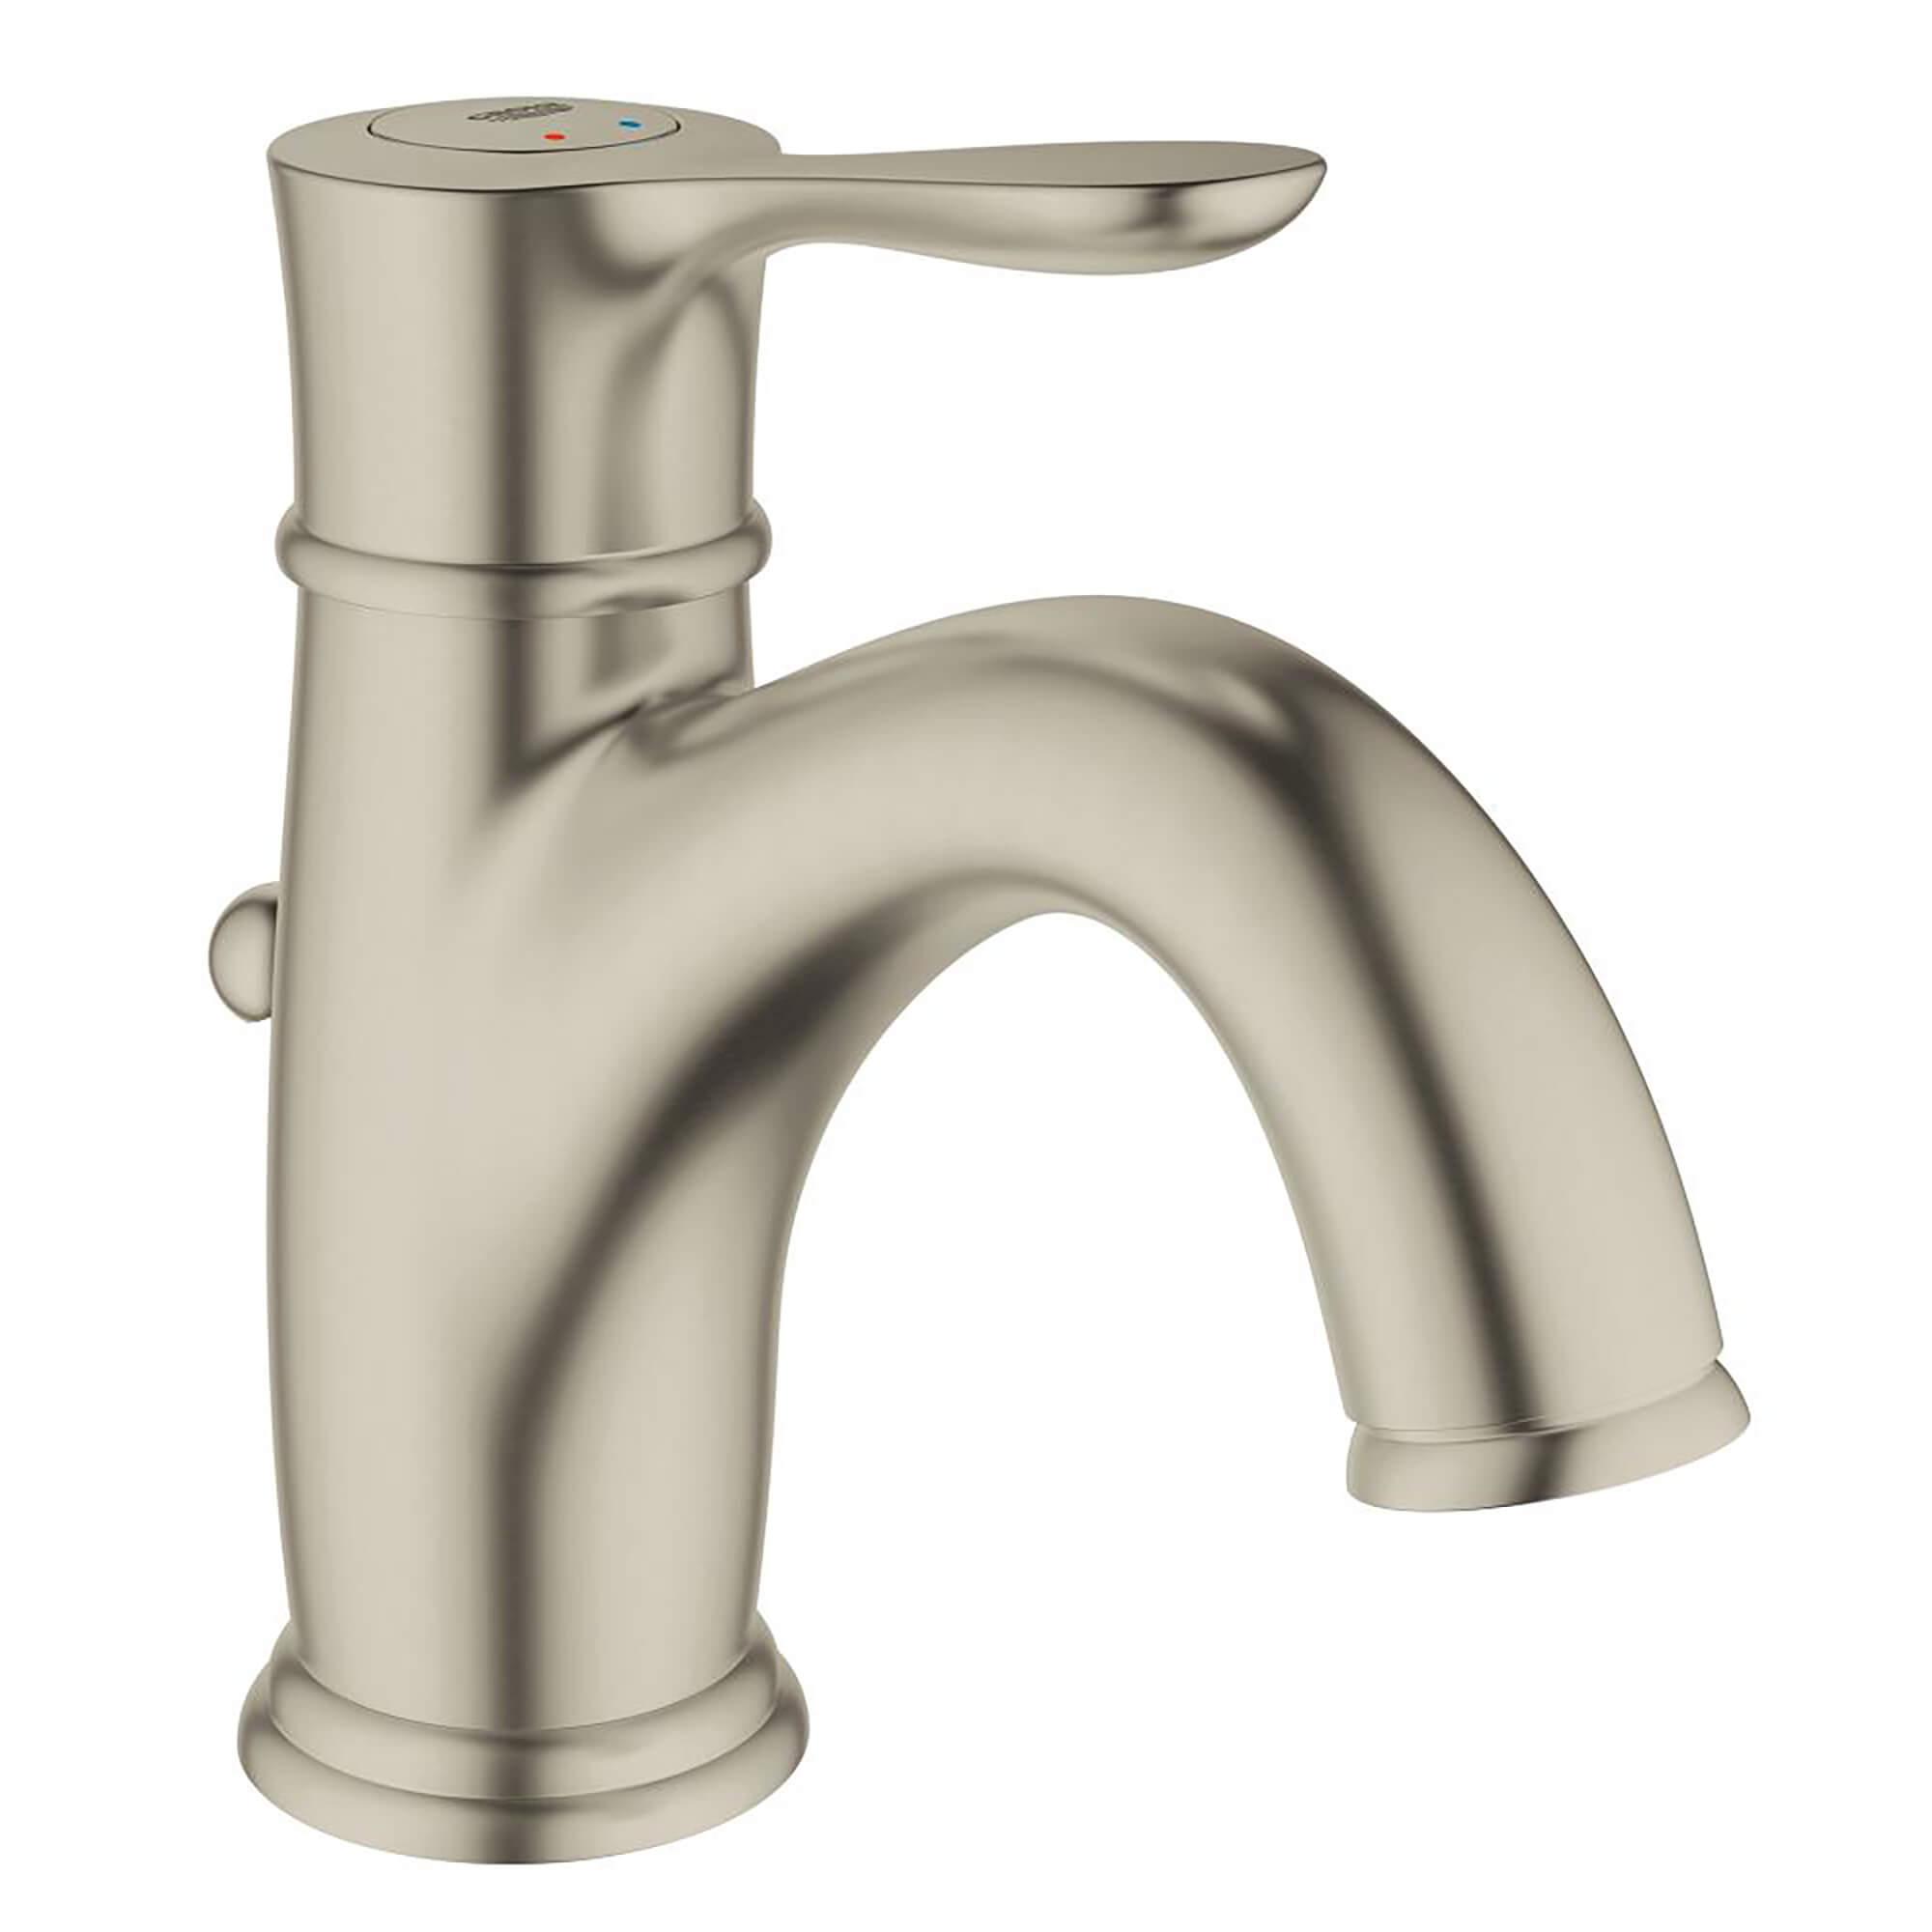 centerset single handle single hole bathroom faucet 1 5 gpm